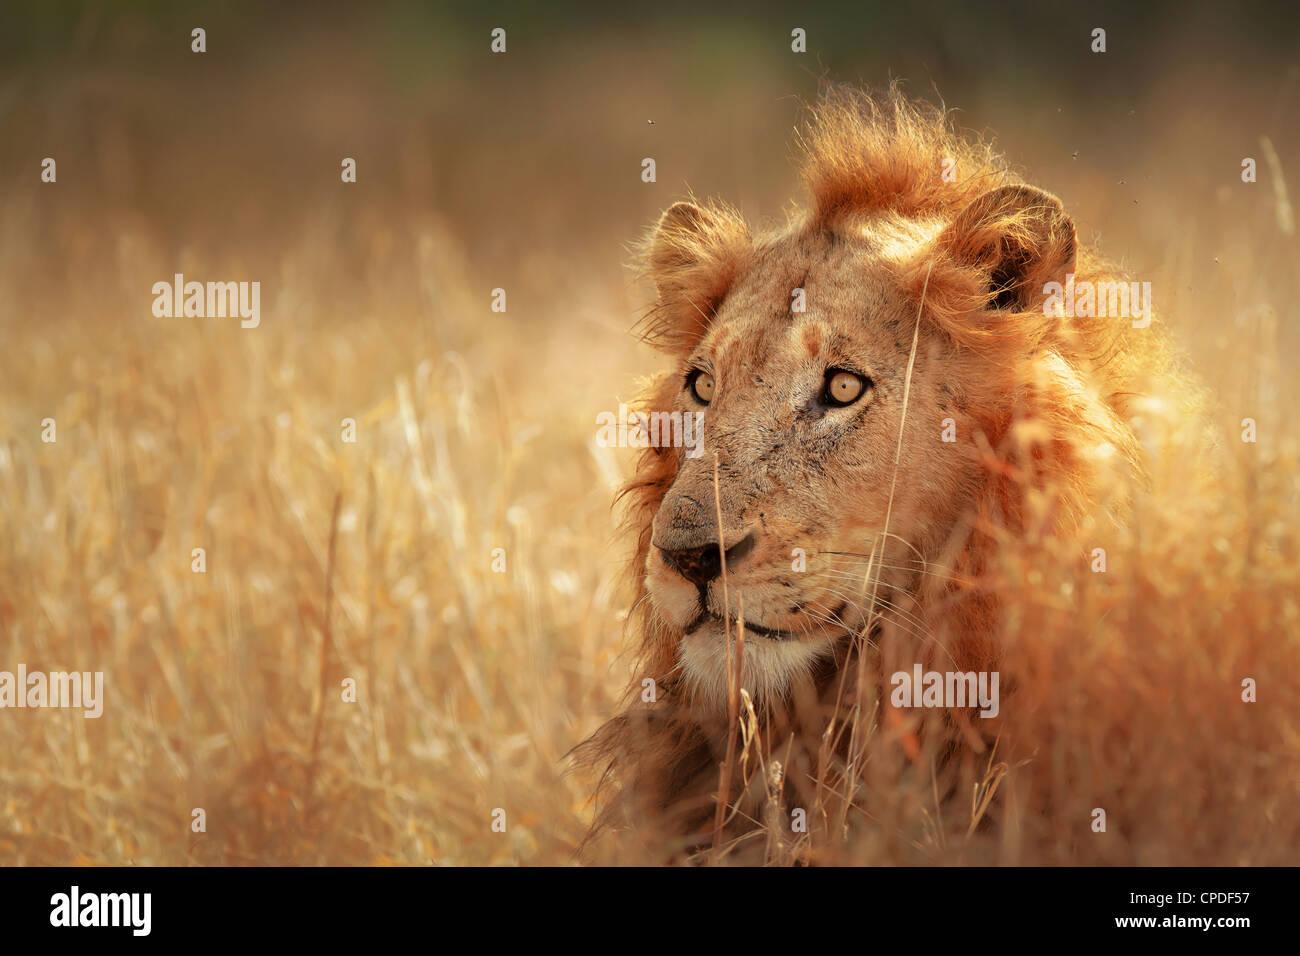 Grande leone maschio giacente nella fitta prateria - Kruger National Park - Sud Africa Immagini Stock